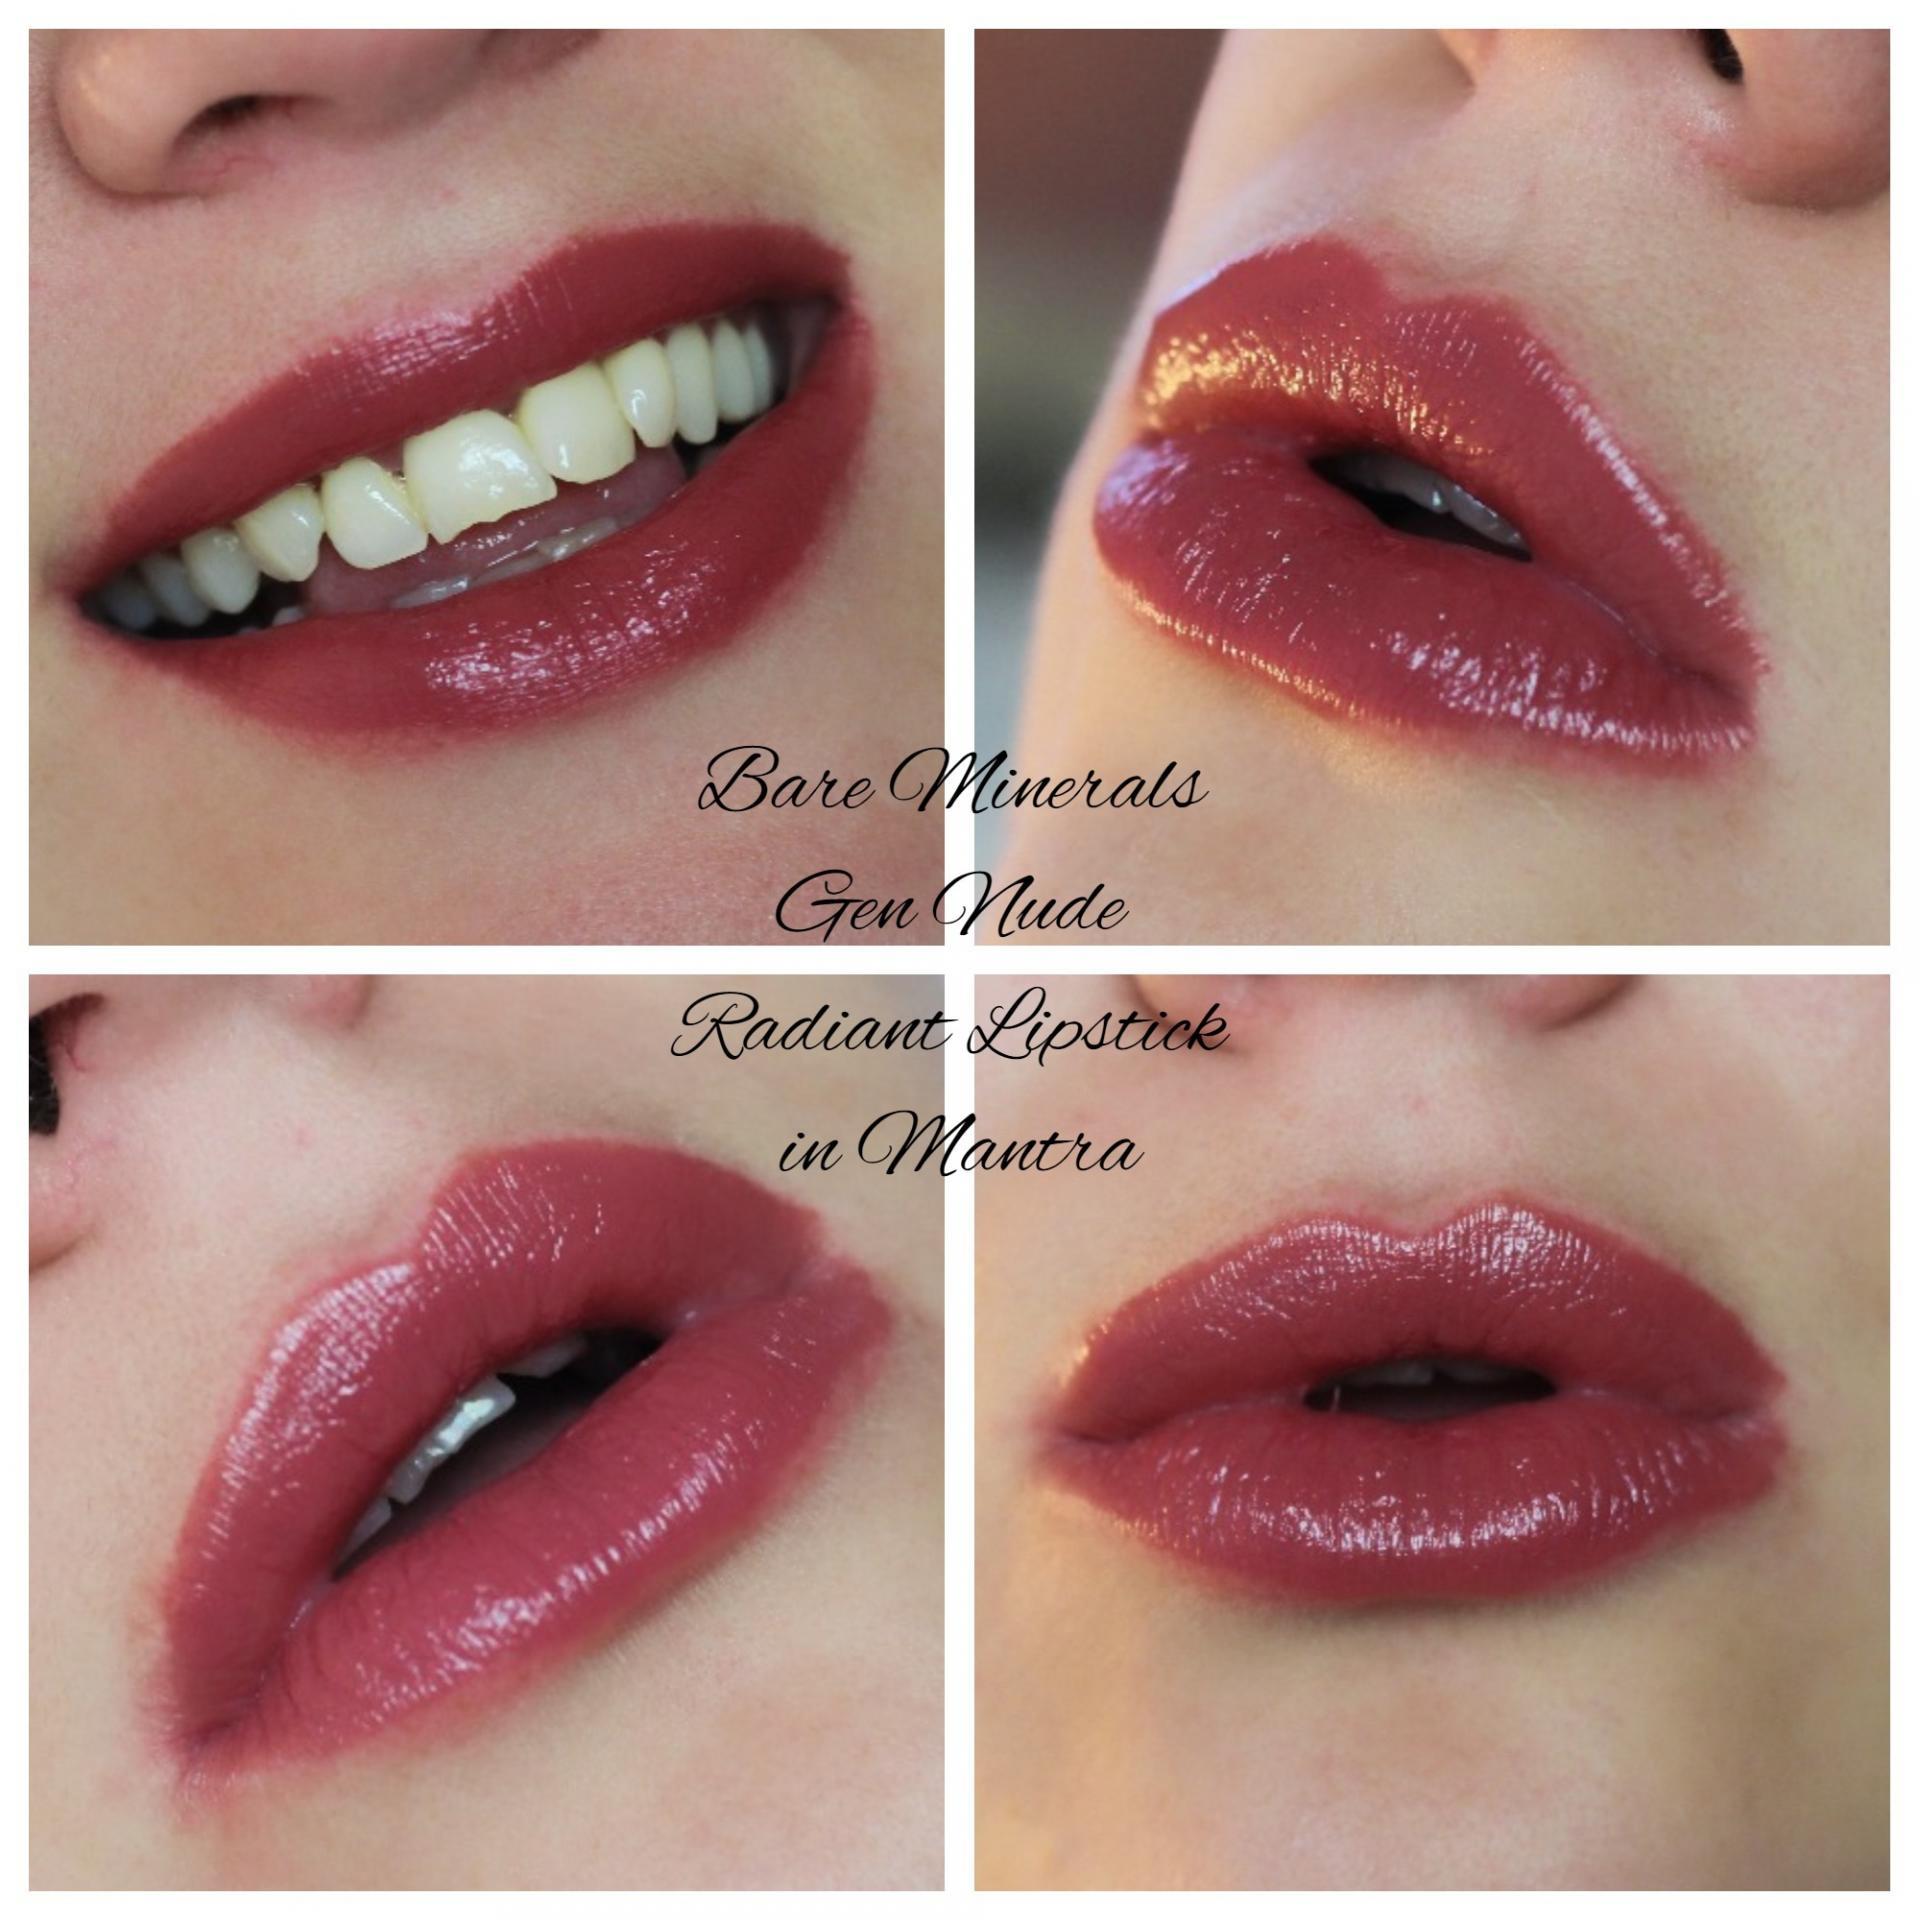 Bare Minerals Gen Nude Radiant lipstick